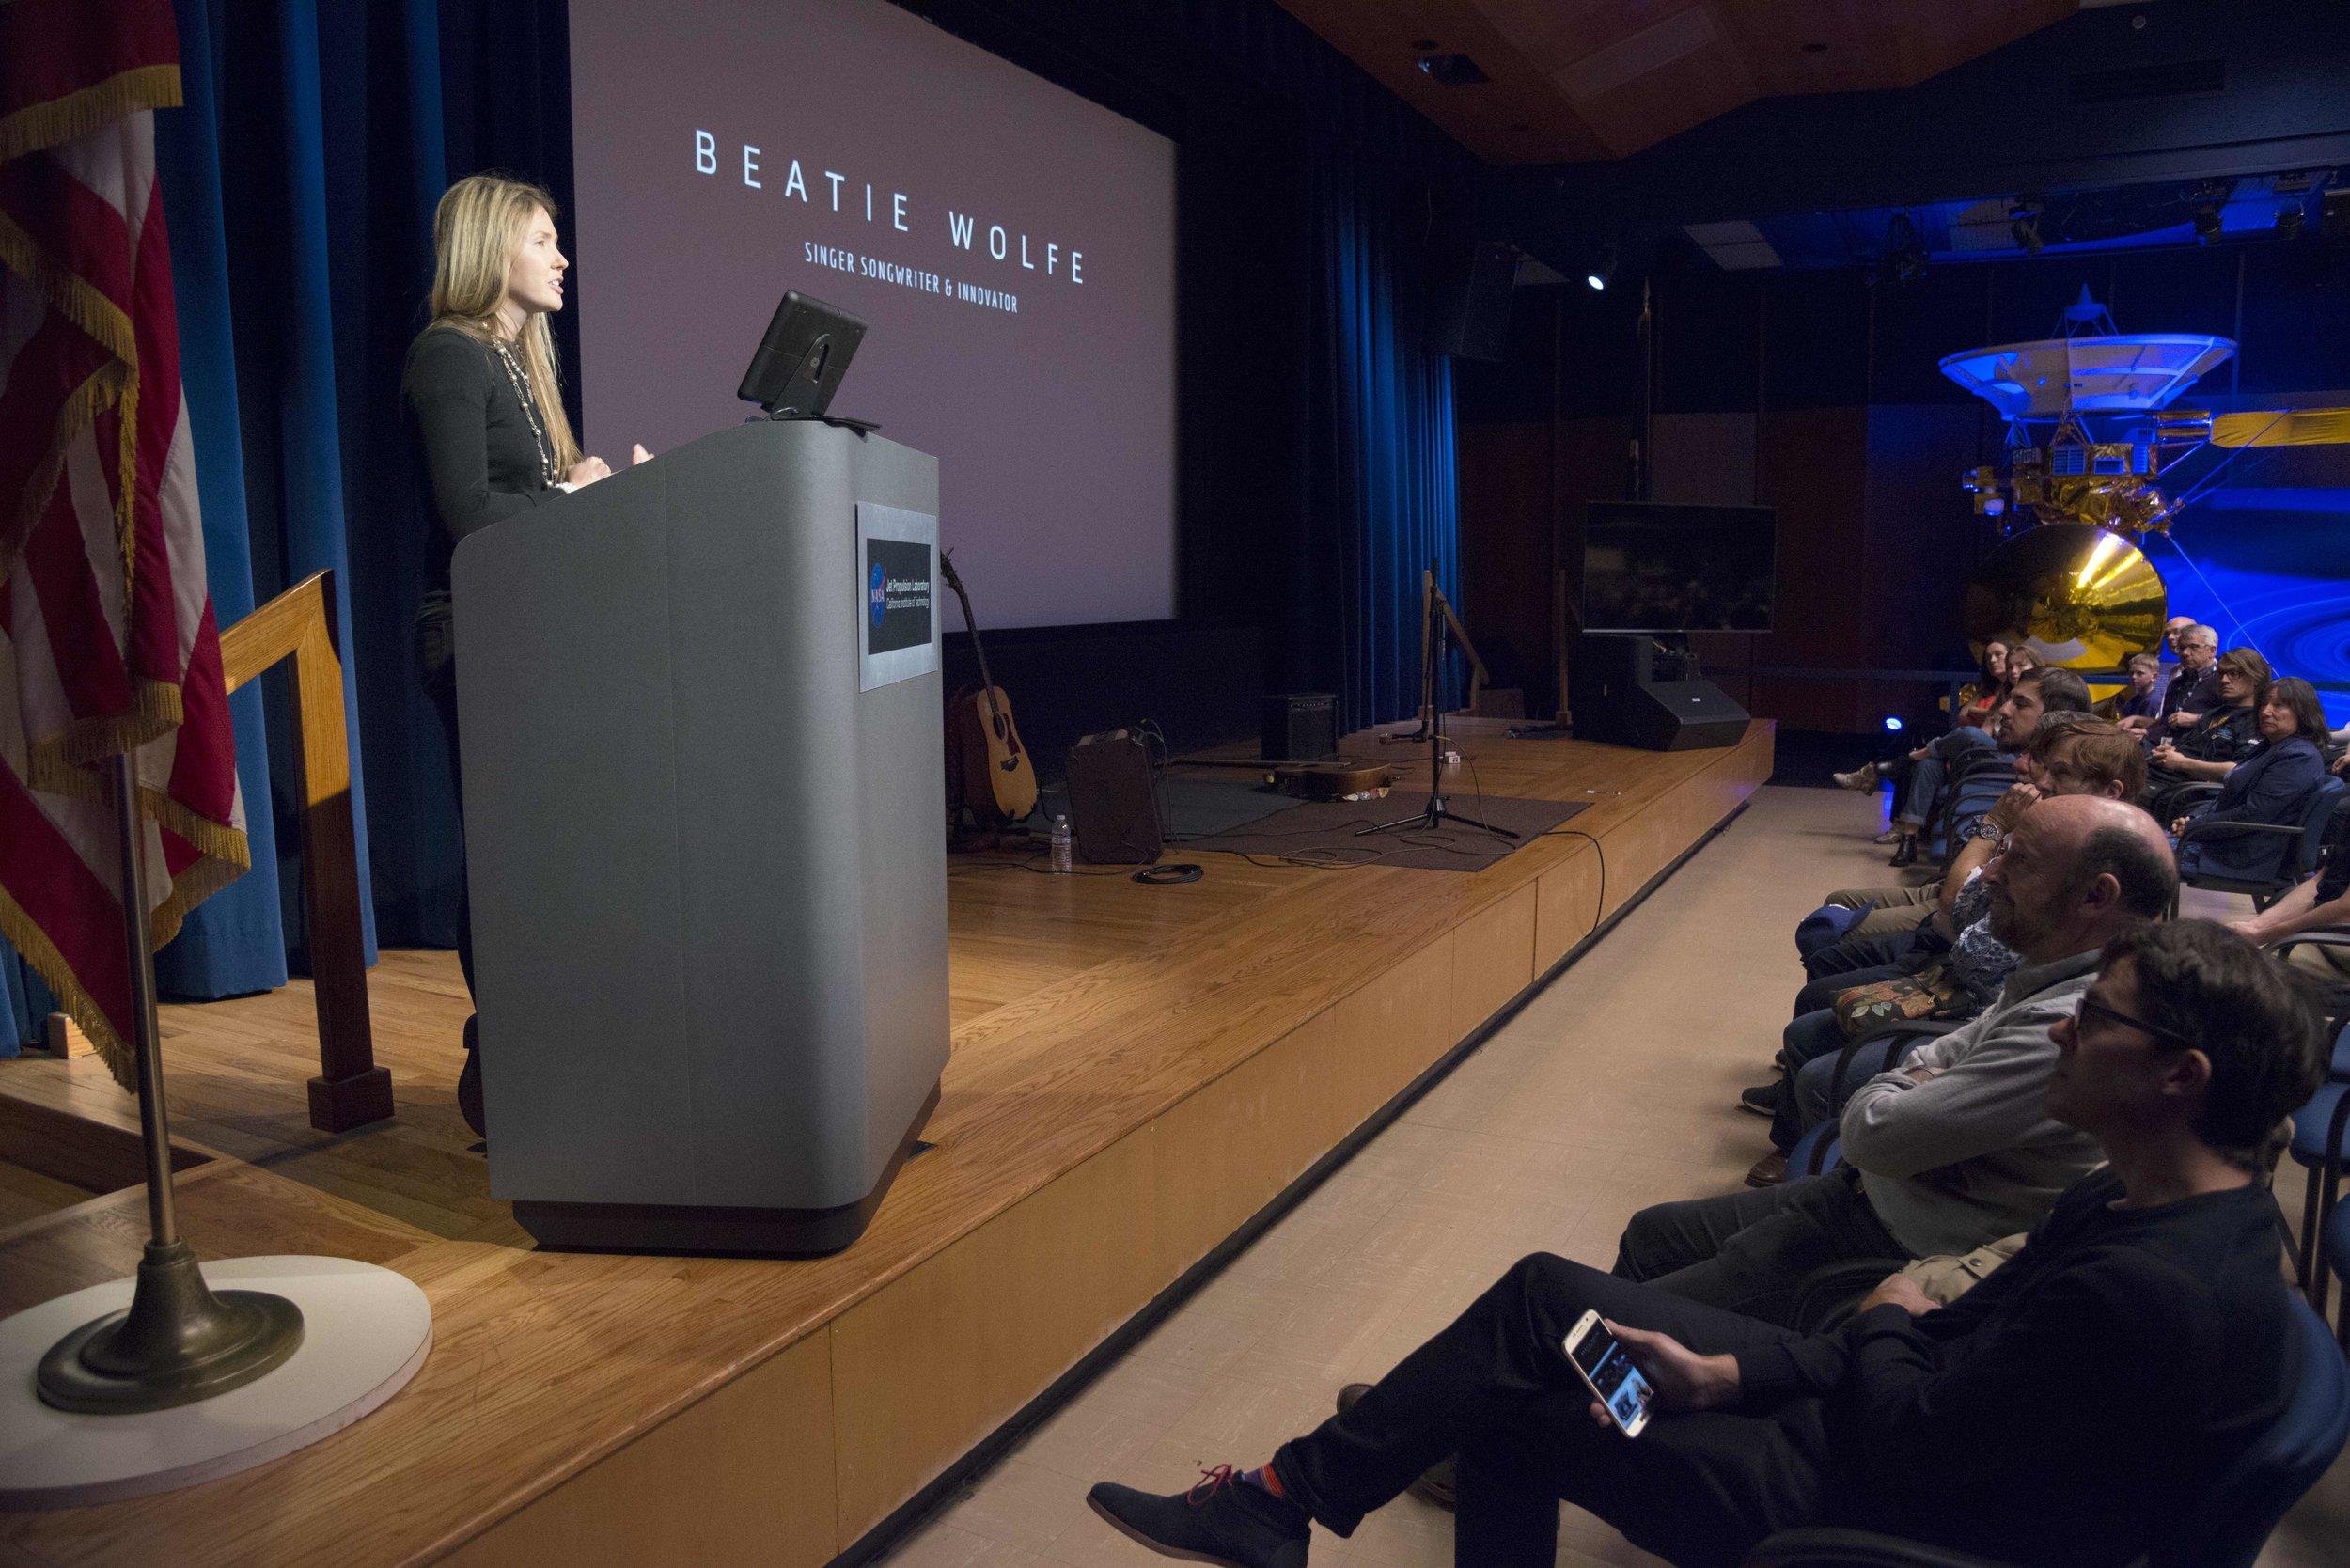 NASA's JPL invites Beatie Wolfe to talk